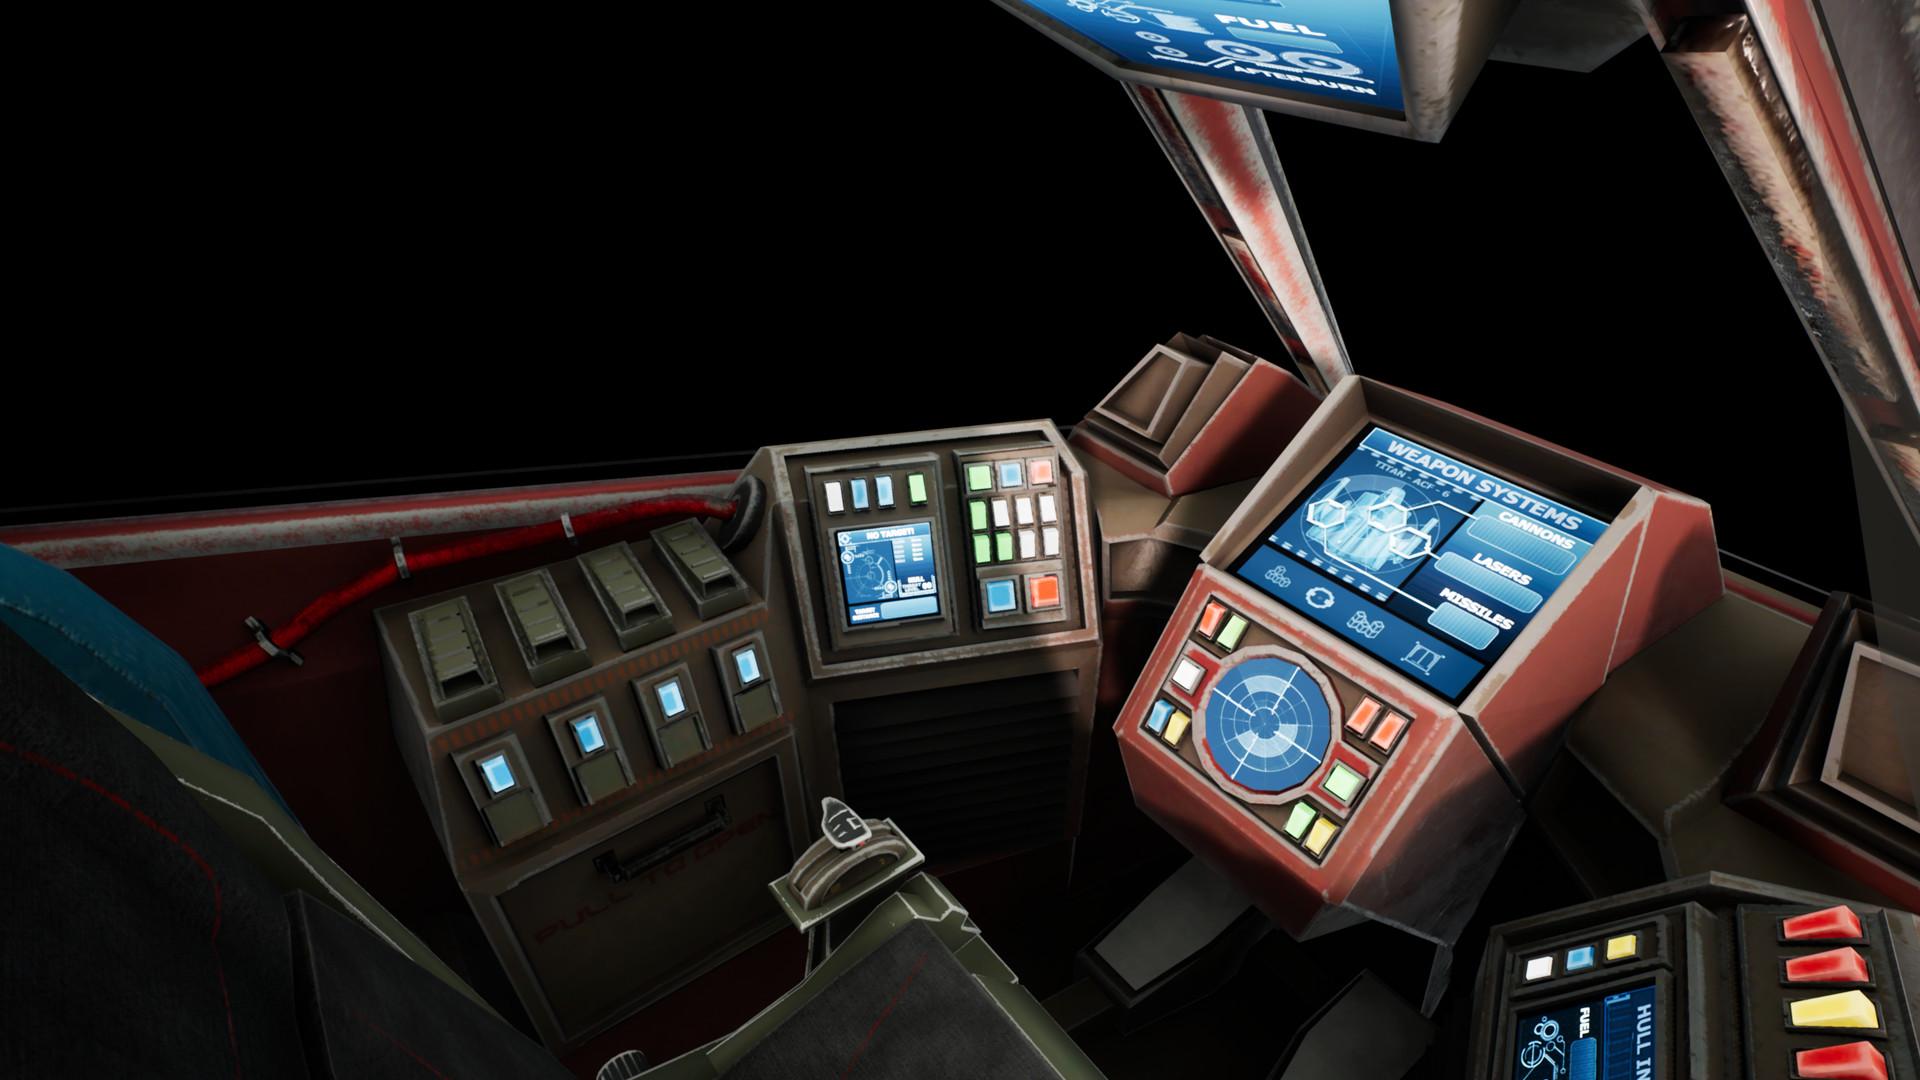 ArtStation - Space Fighter Cockpit - Starfighter, Shaun Williams